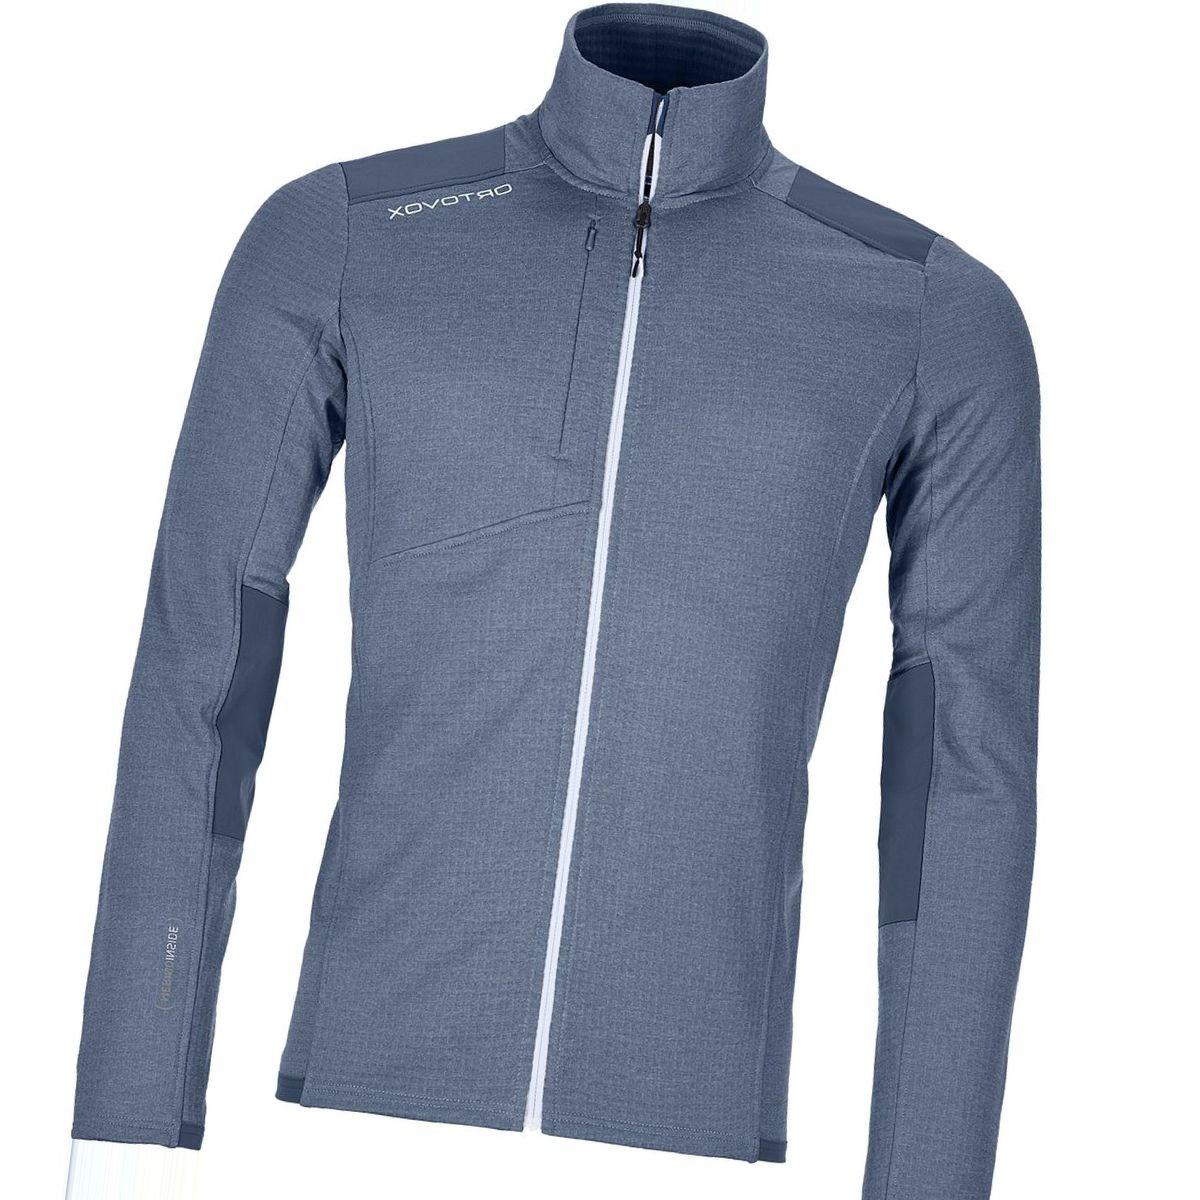 Ortovox Fleece Light Grid Jacket - Men's